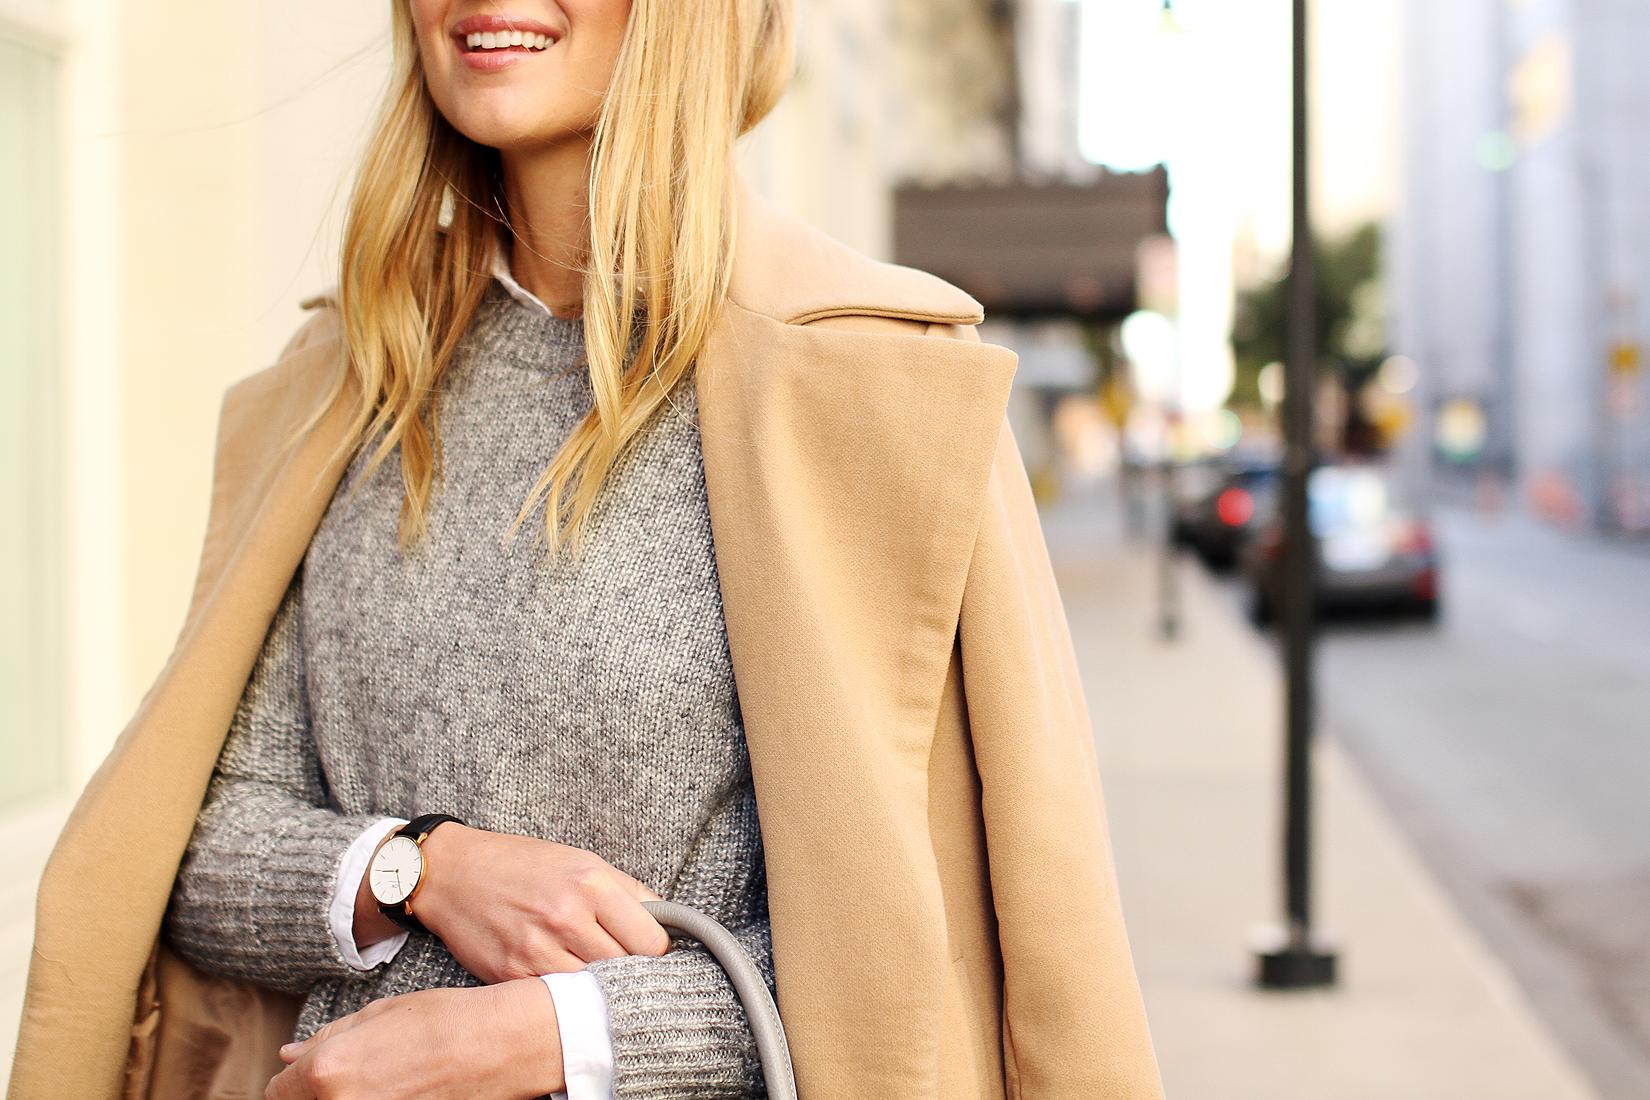 fashion-jackson-daniel-wellington-watch-grey-sweater-camel-coat